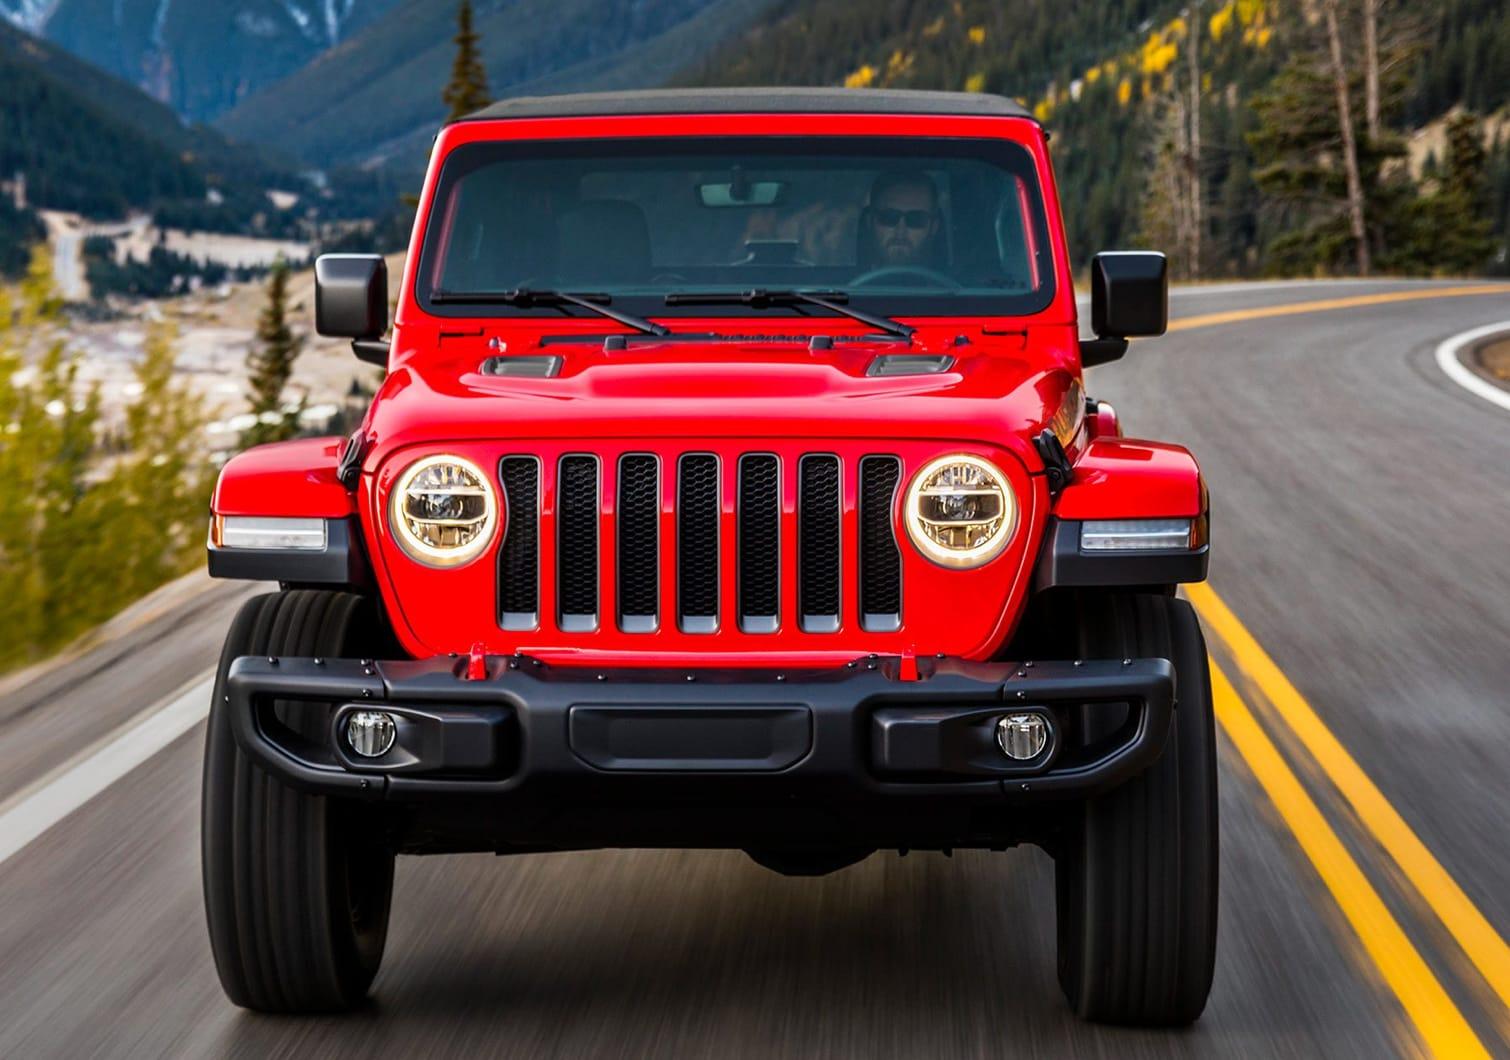 Jeep Dealers Near Me >> 2018 Jeep Wrangler Dealer Near Me Long Island Ny